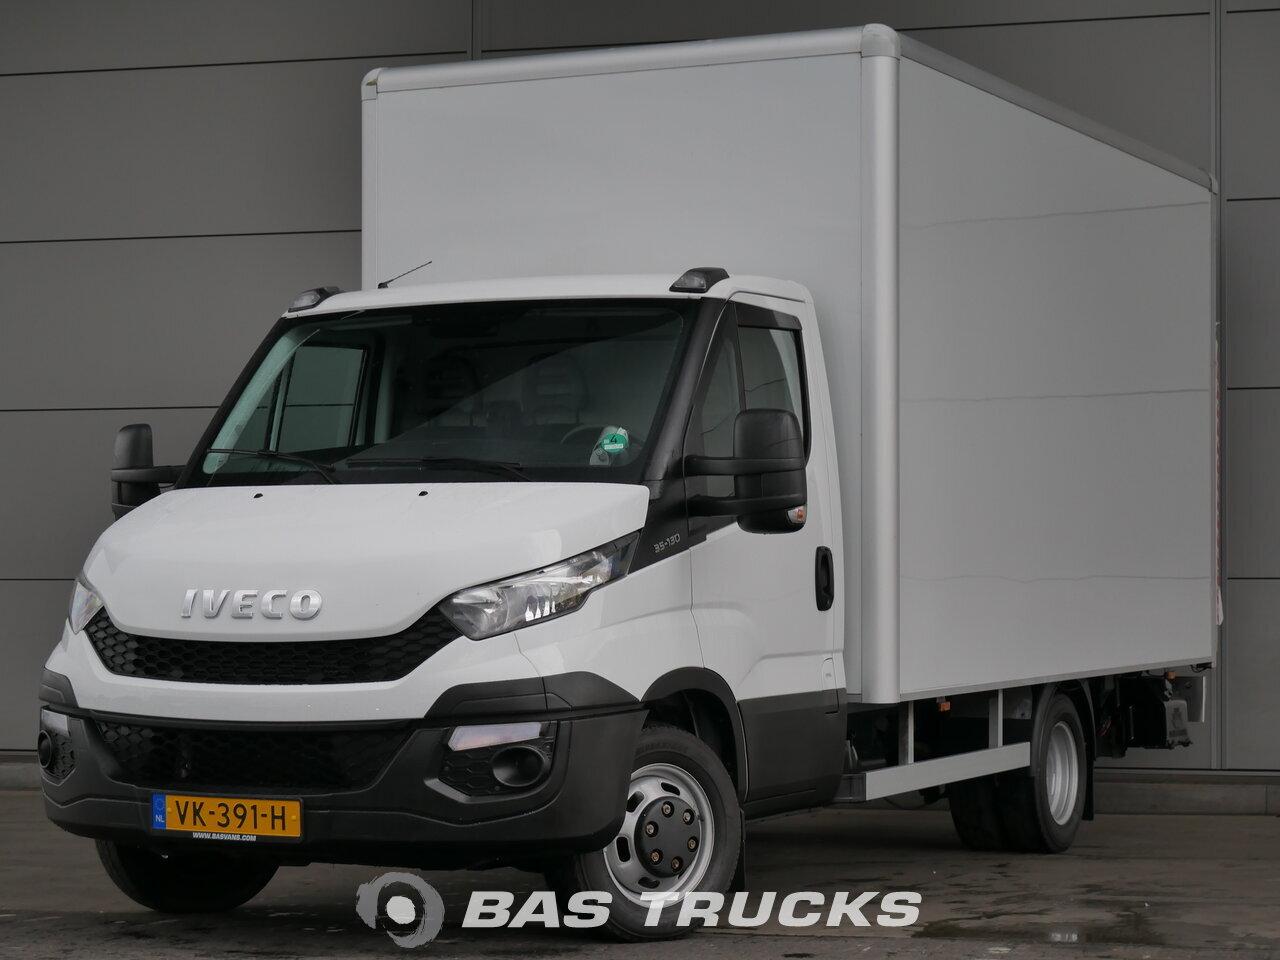 iveco daily light commercial vehicle 24900 bas vans. Black Bedroom Furniture Sets. Home Design Ideas